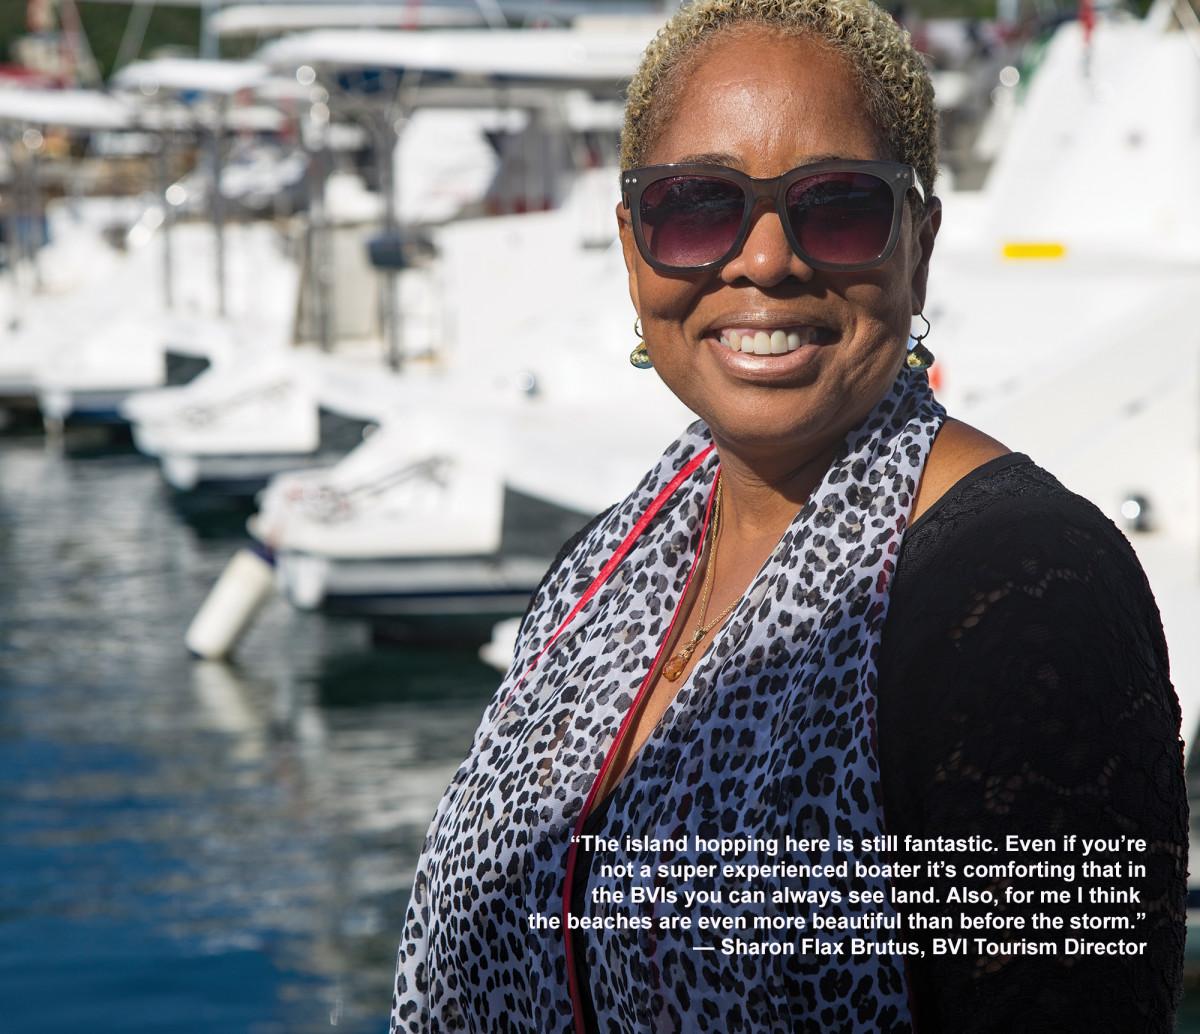 Sharon Flax Brutus, BVI Tourism Director